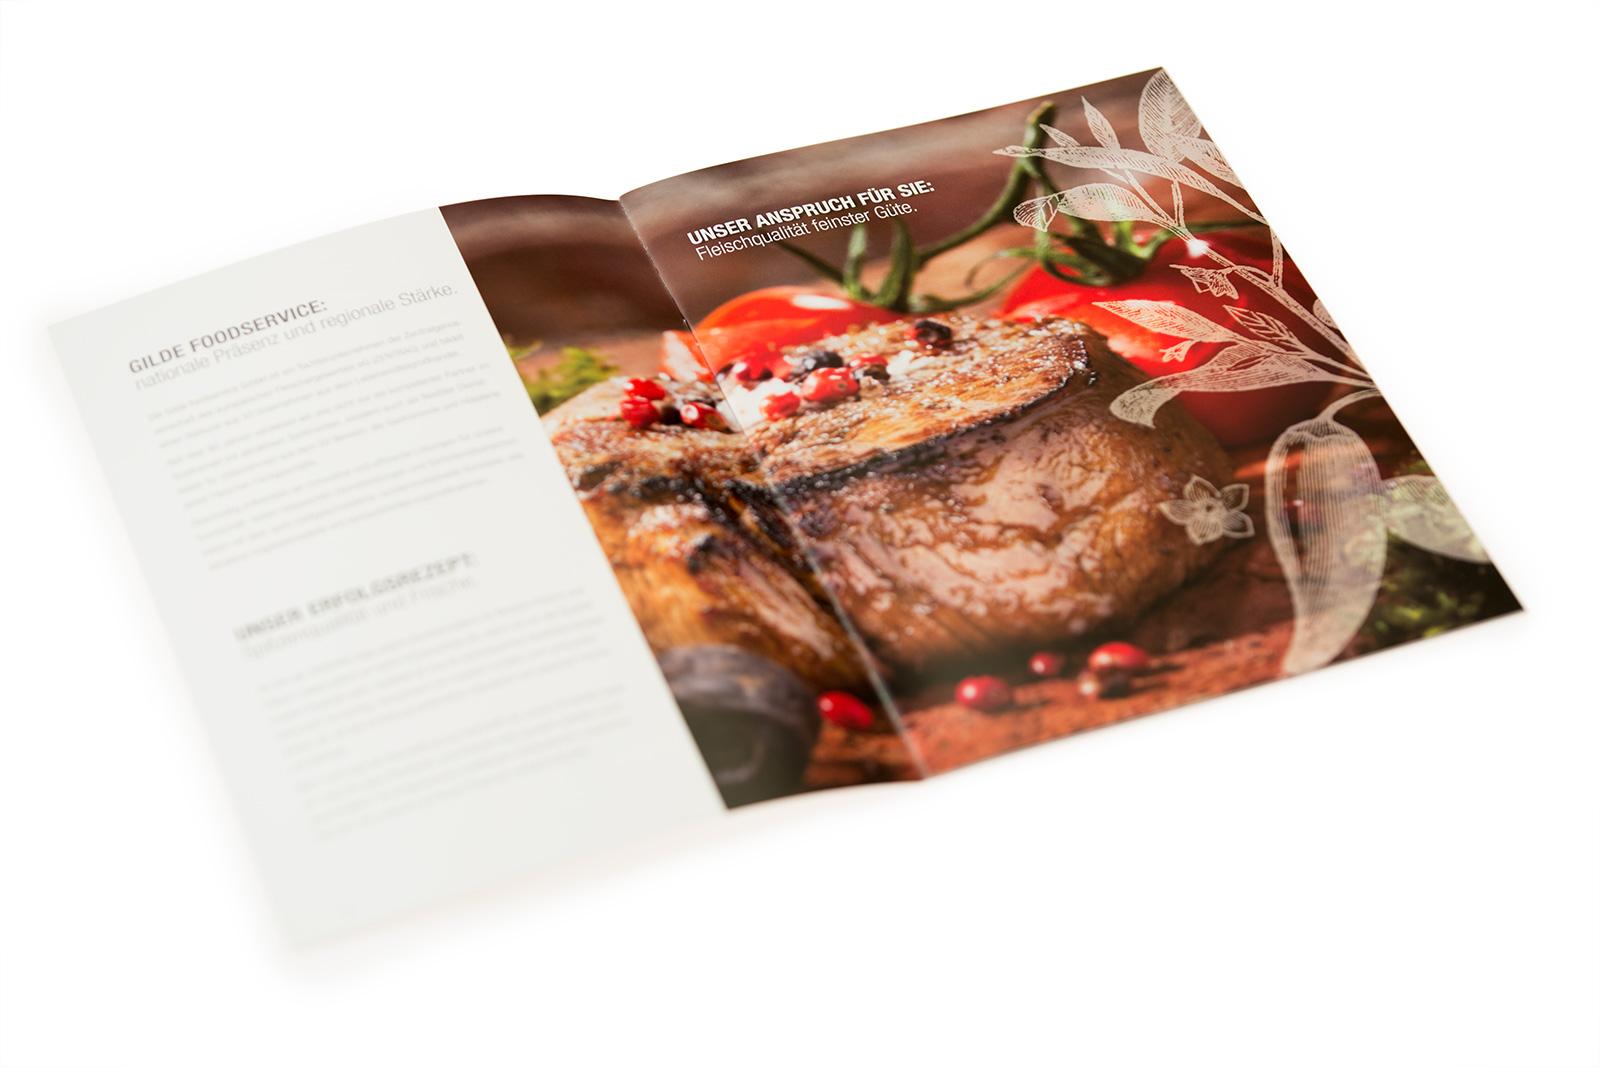 Gilde_Food-Katalog_Fleischsortiment